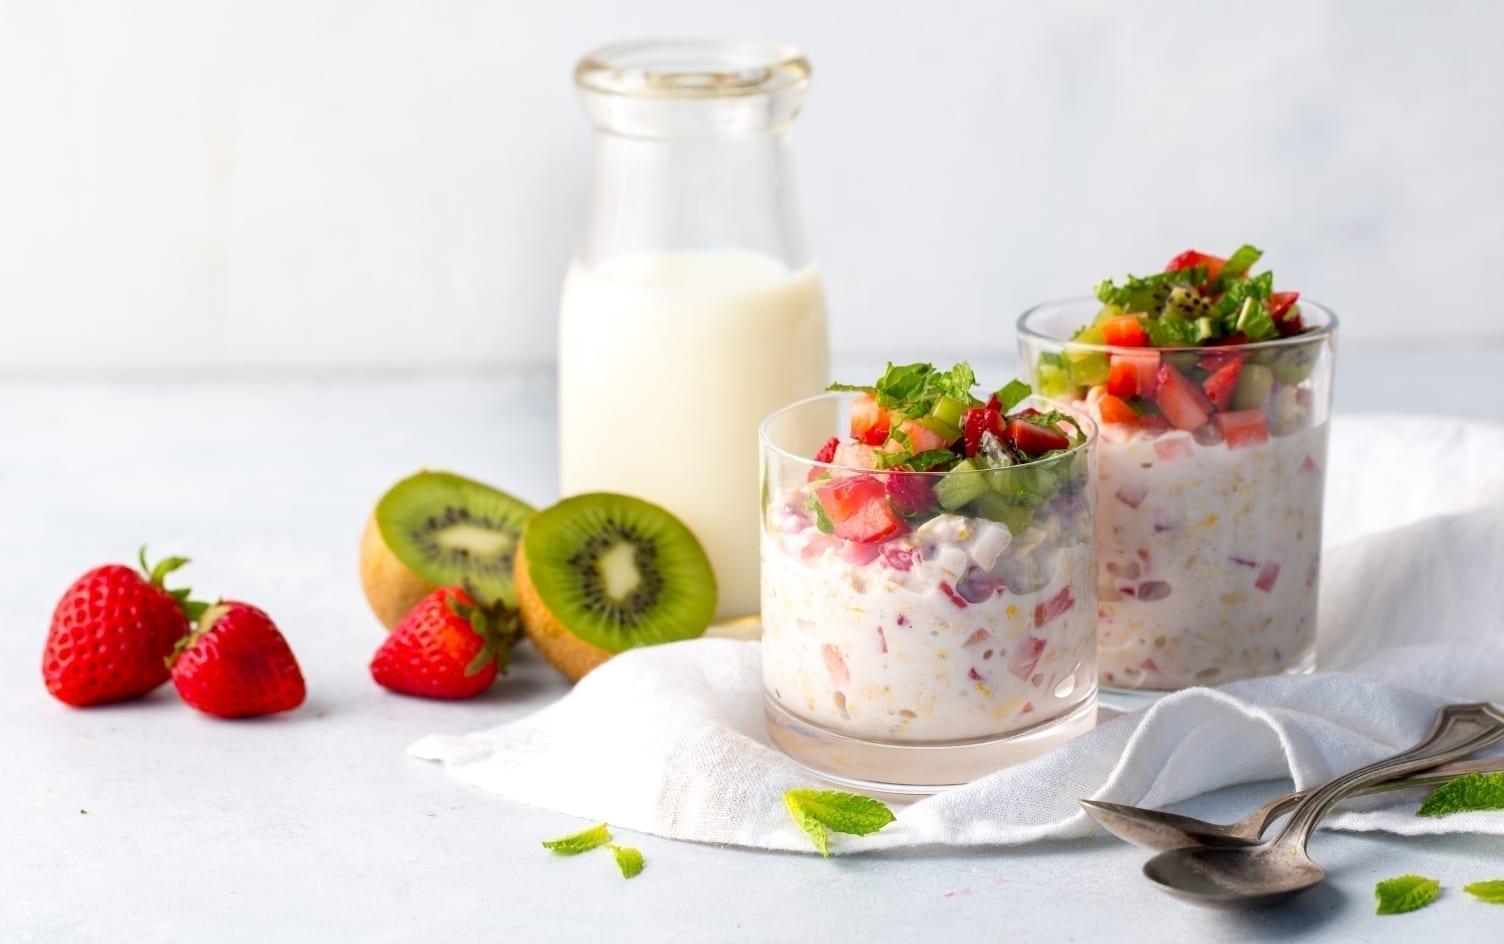 Lemony Strawberry Oat Soak With Kiwi Mint